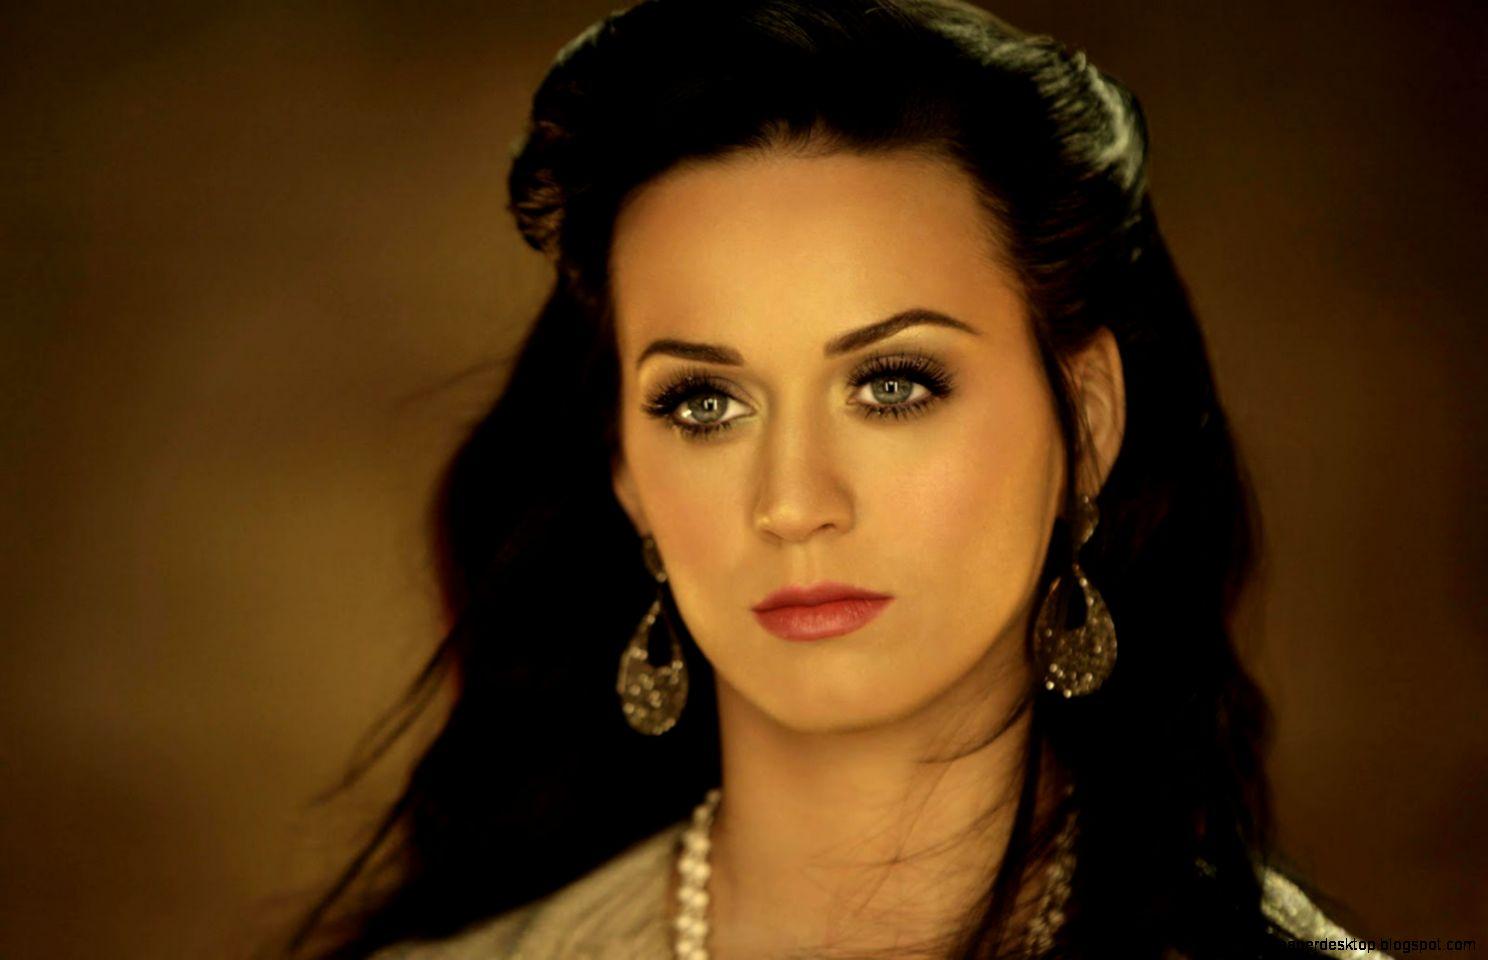 Katy Perry Girl Celebrity Music Hd Wallpaper  All Desktop Wallpaper